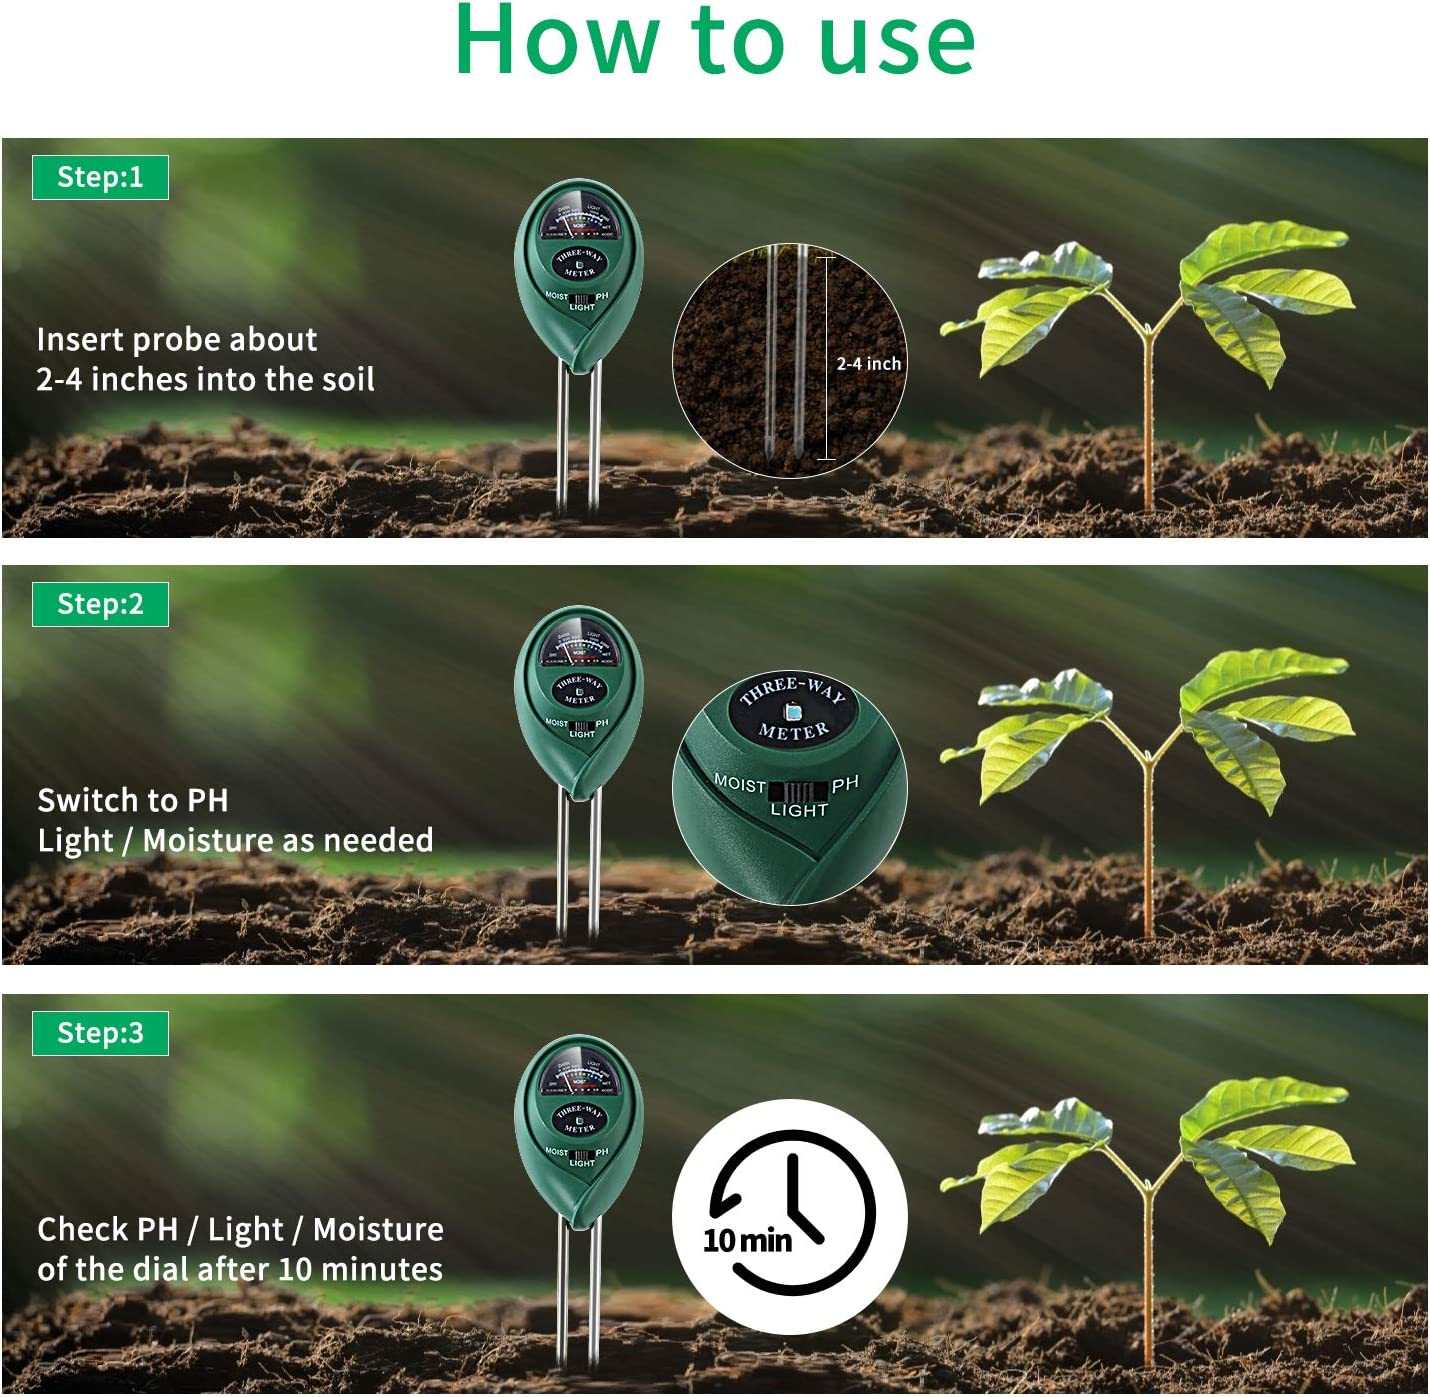 Alkey Soil Moisture MeterHow to Use Instructions